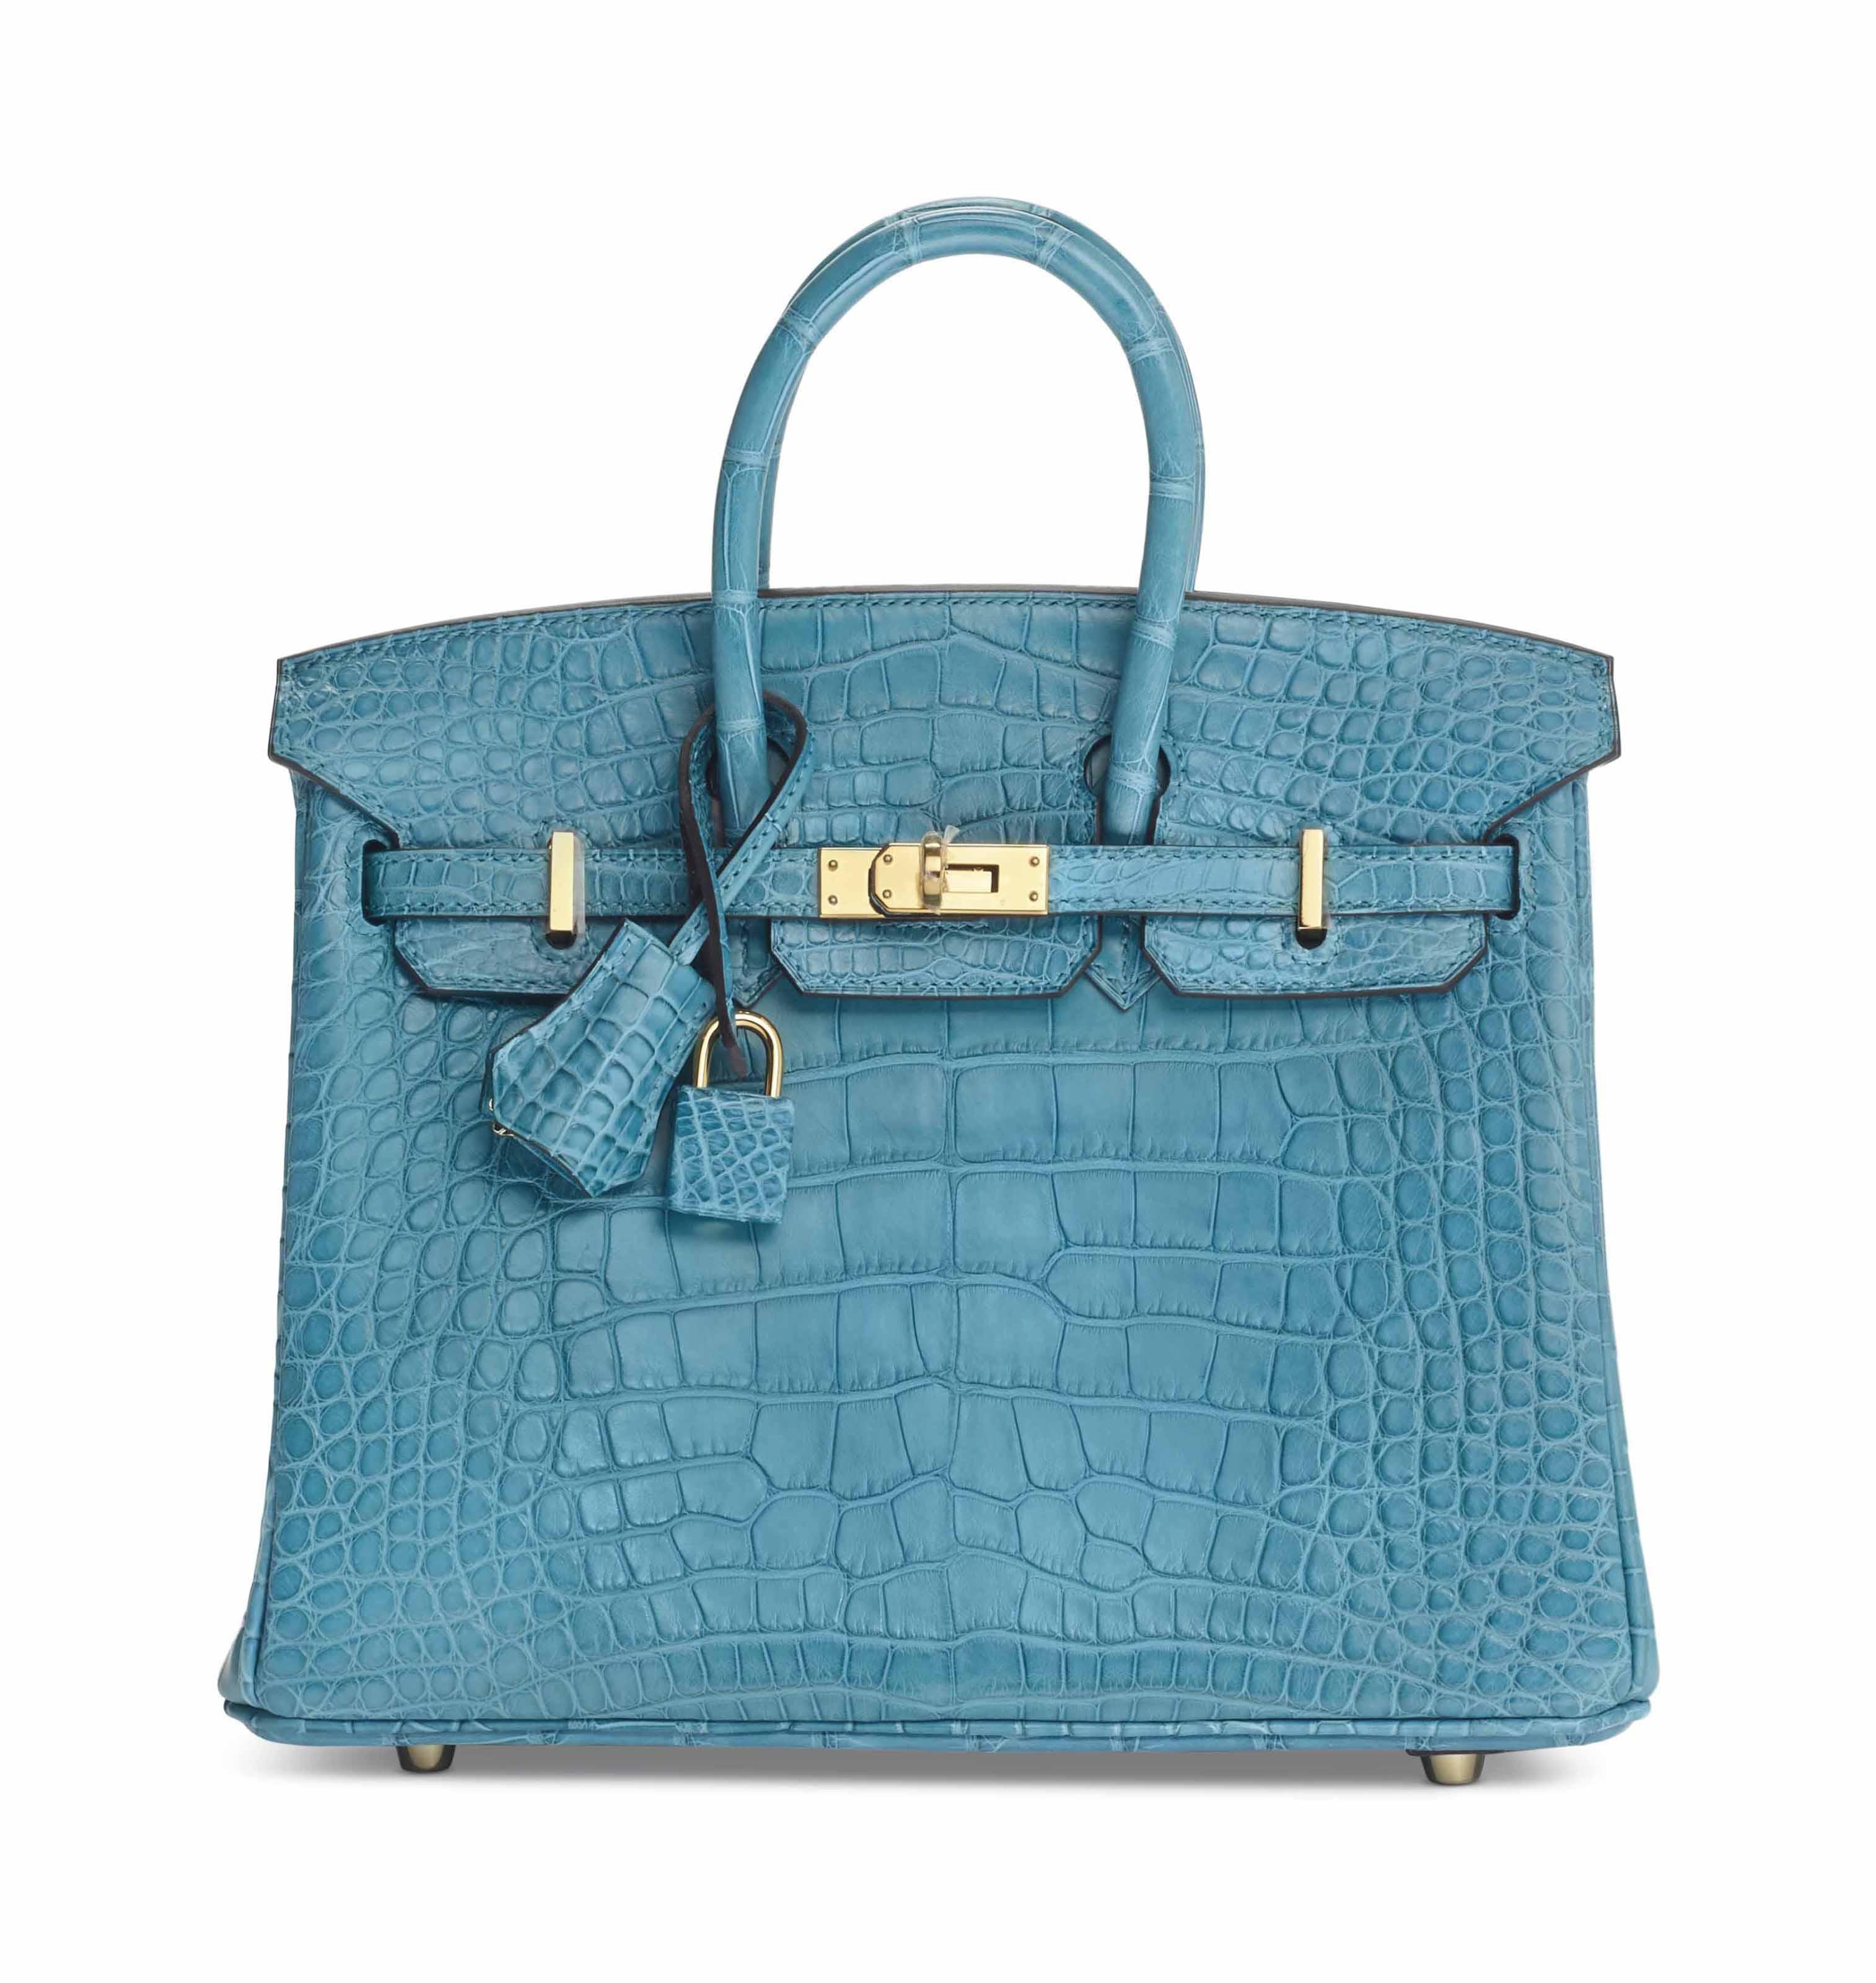 c5148930ef ... where to buy sac birkin 25 en alligator mat bleu paon hermÈs f1445 14dc8